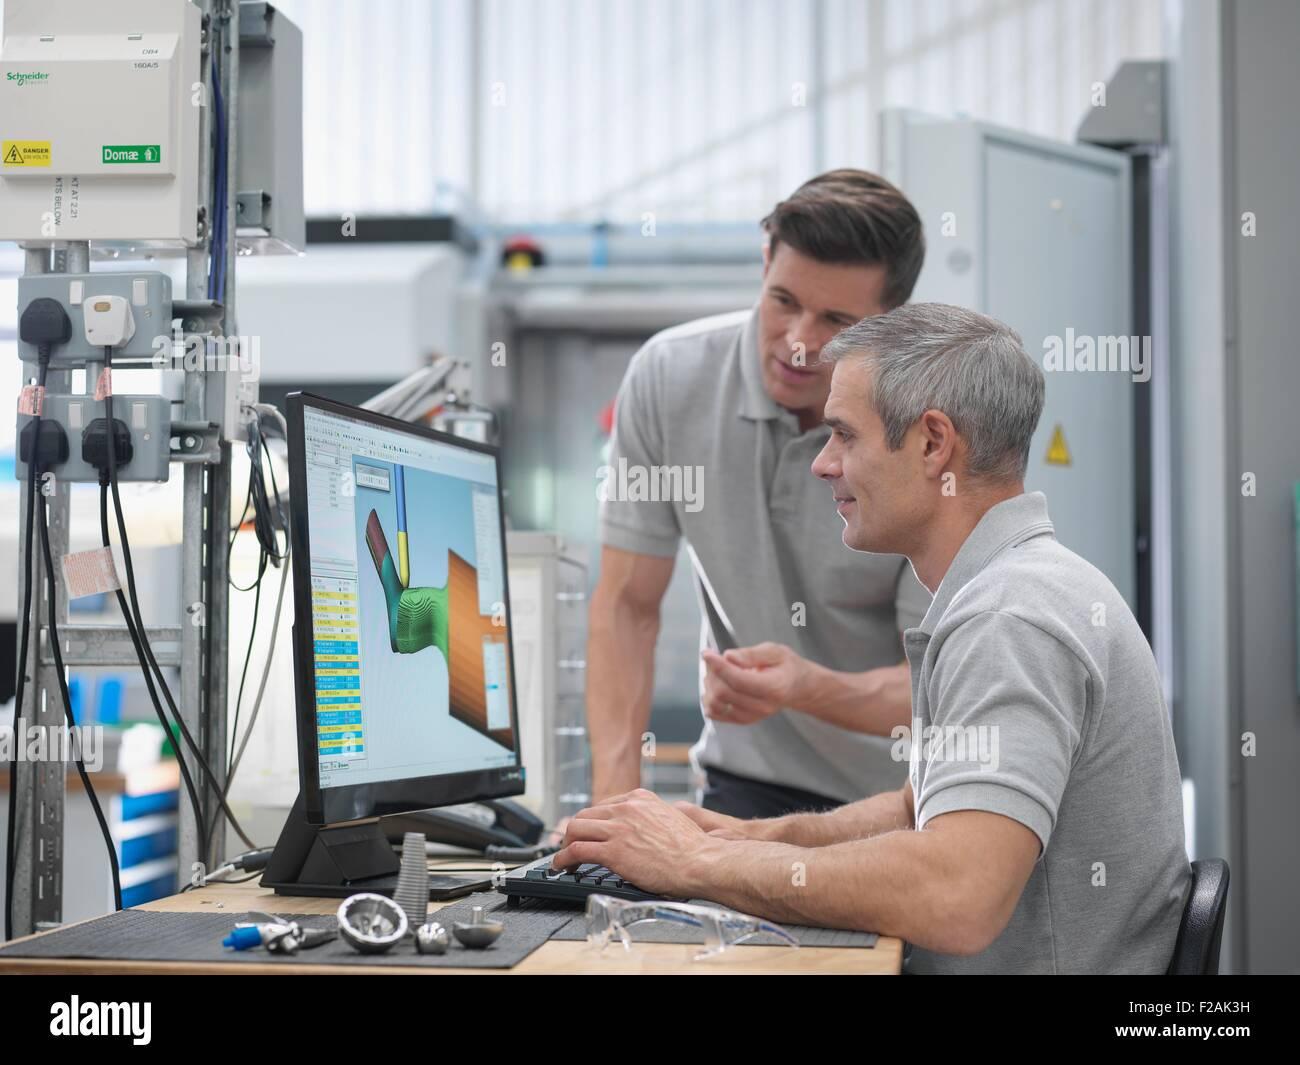 Engineers watching CNC lathe progress on screen in orthopaedic factory - Stock Image